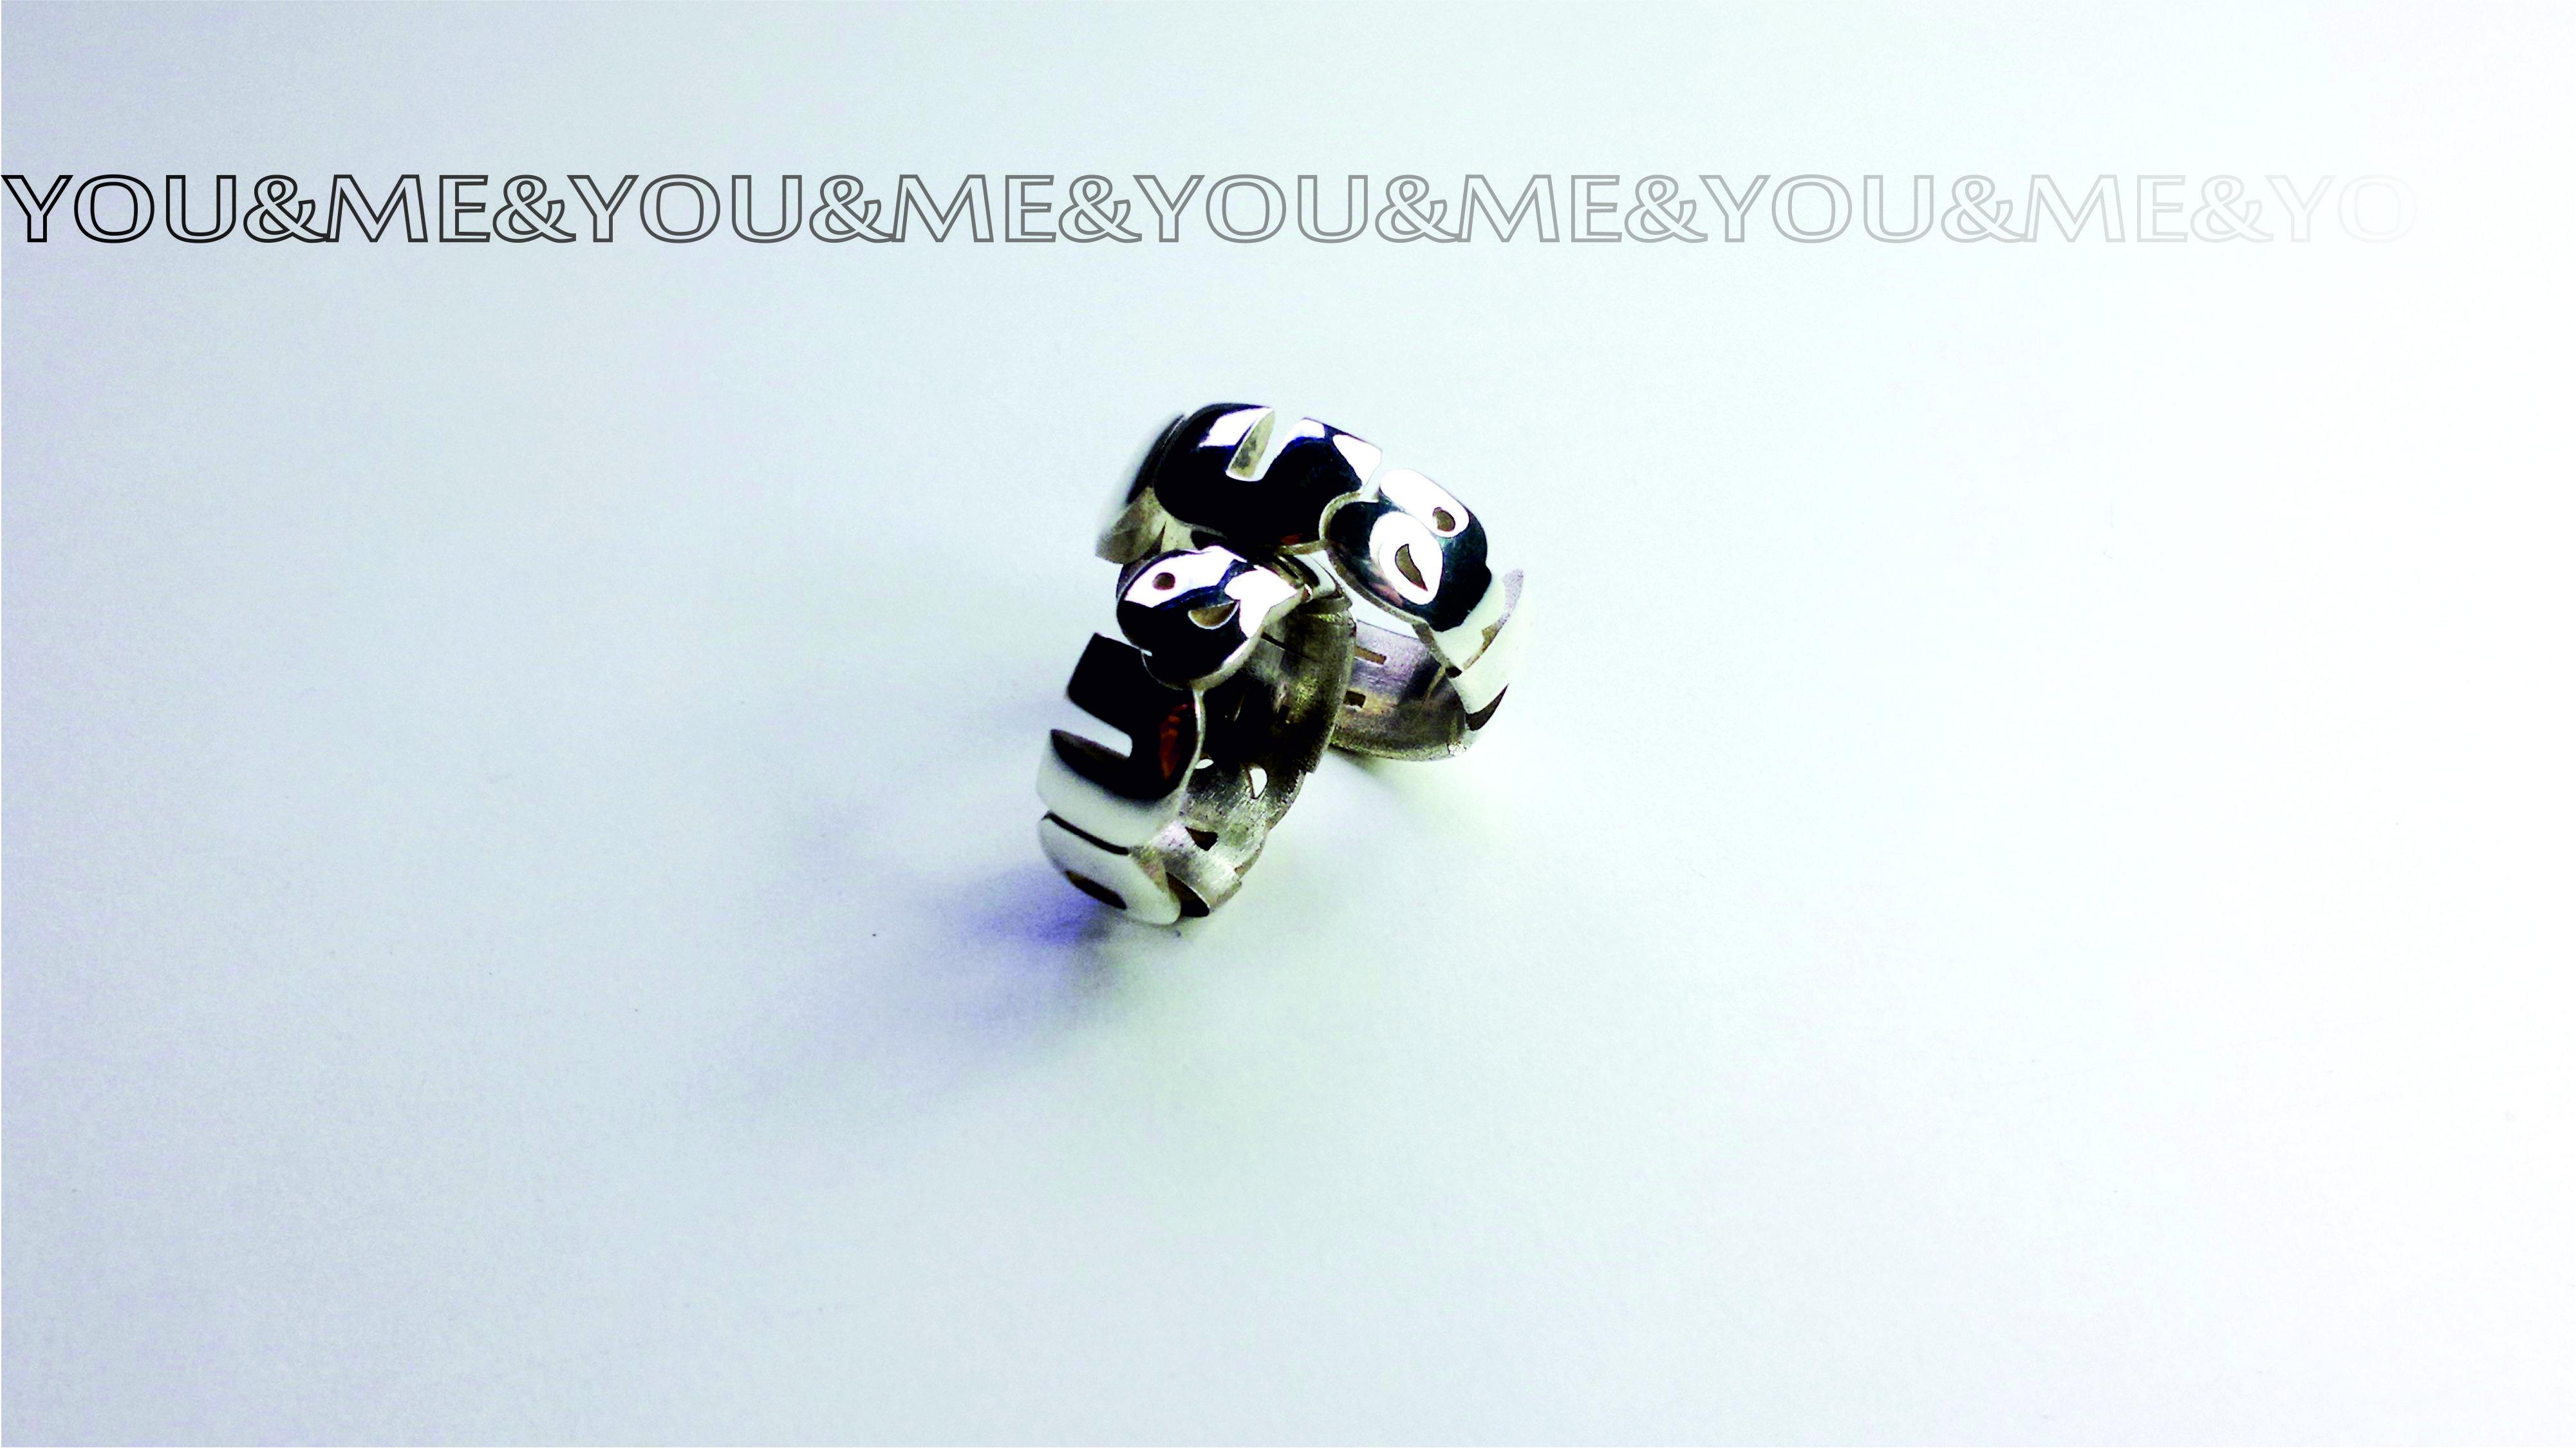 YOU&ME 3.jpg